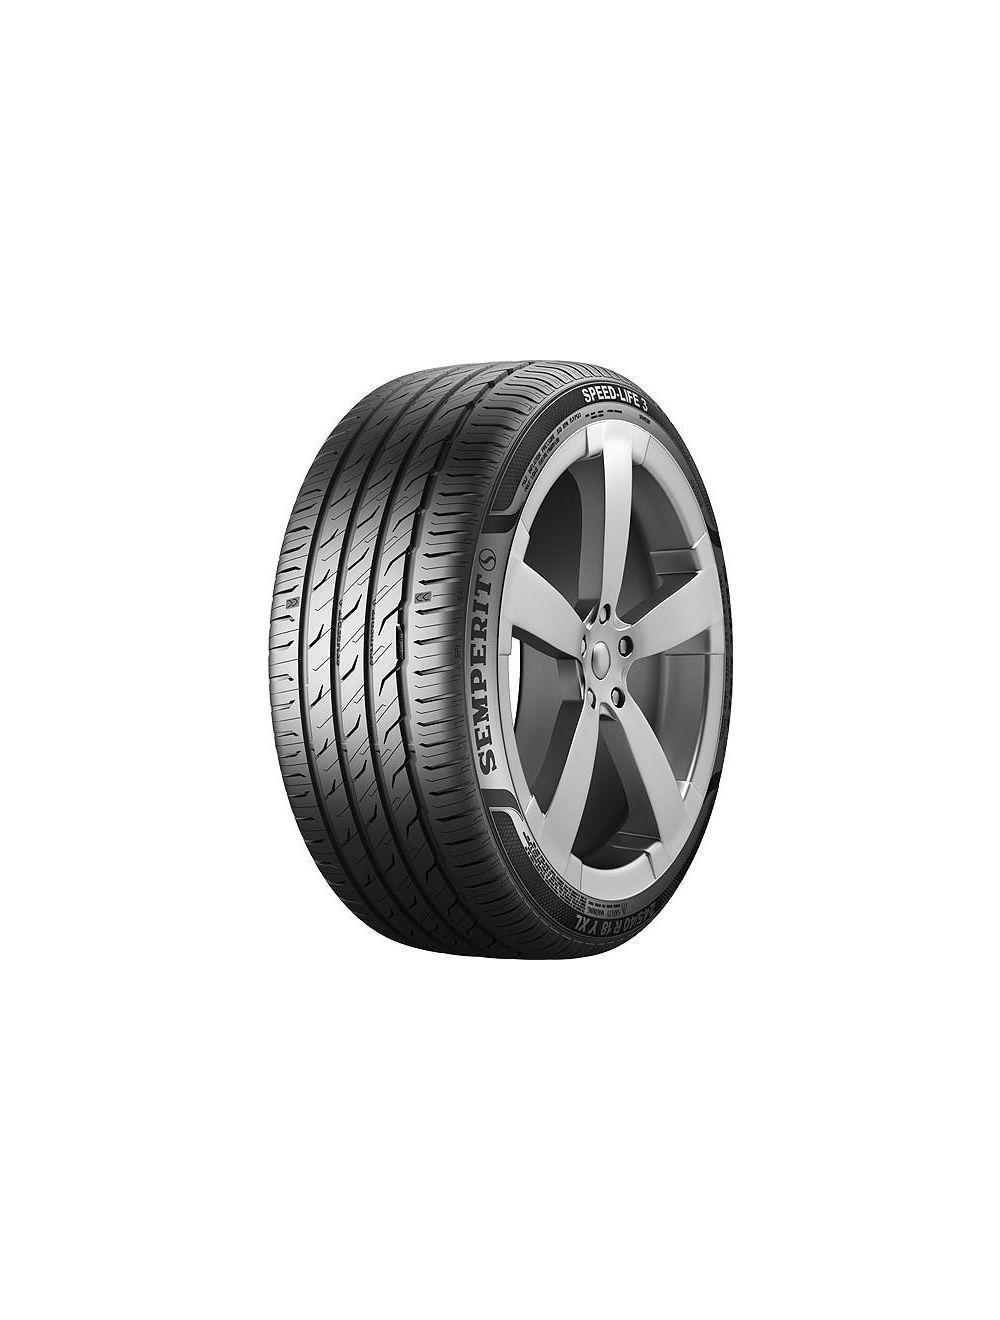 Semperit 215/50R17 Y Speed-Life 3 FR Nyári gumi